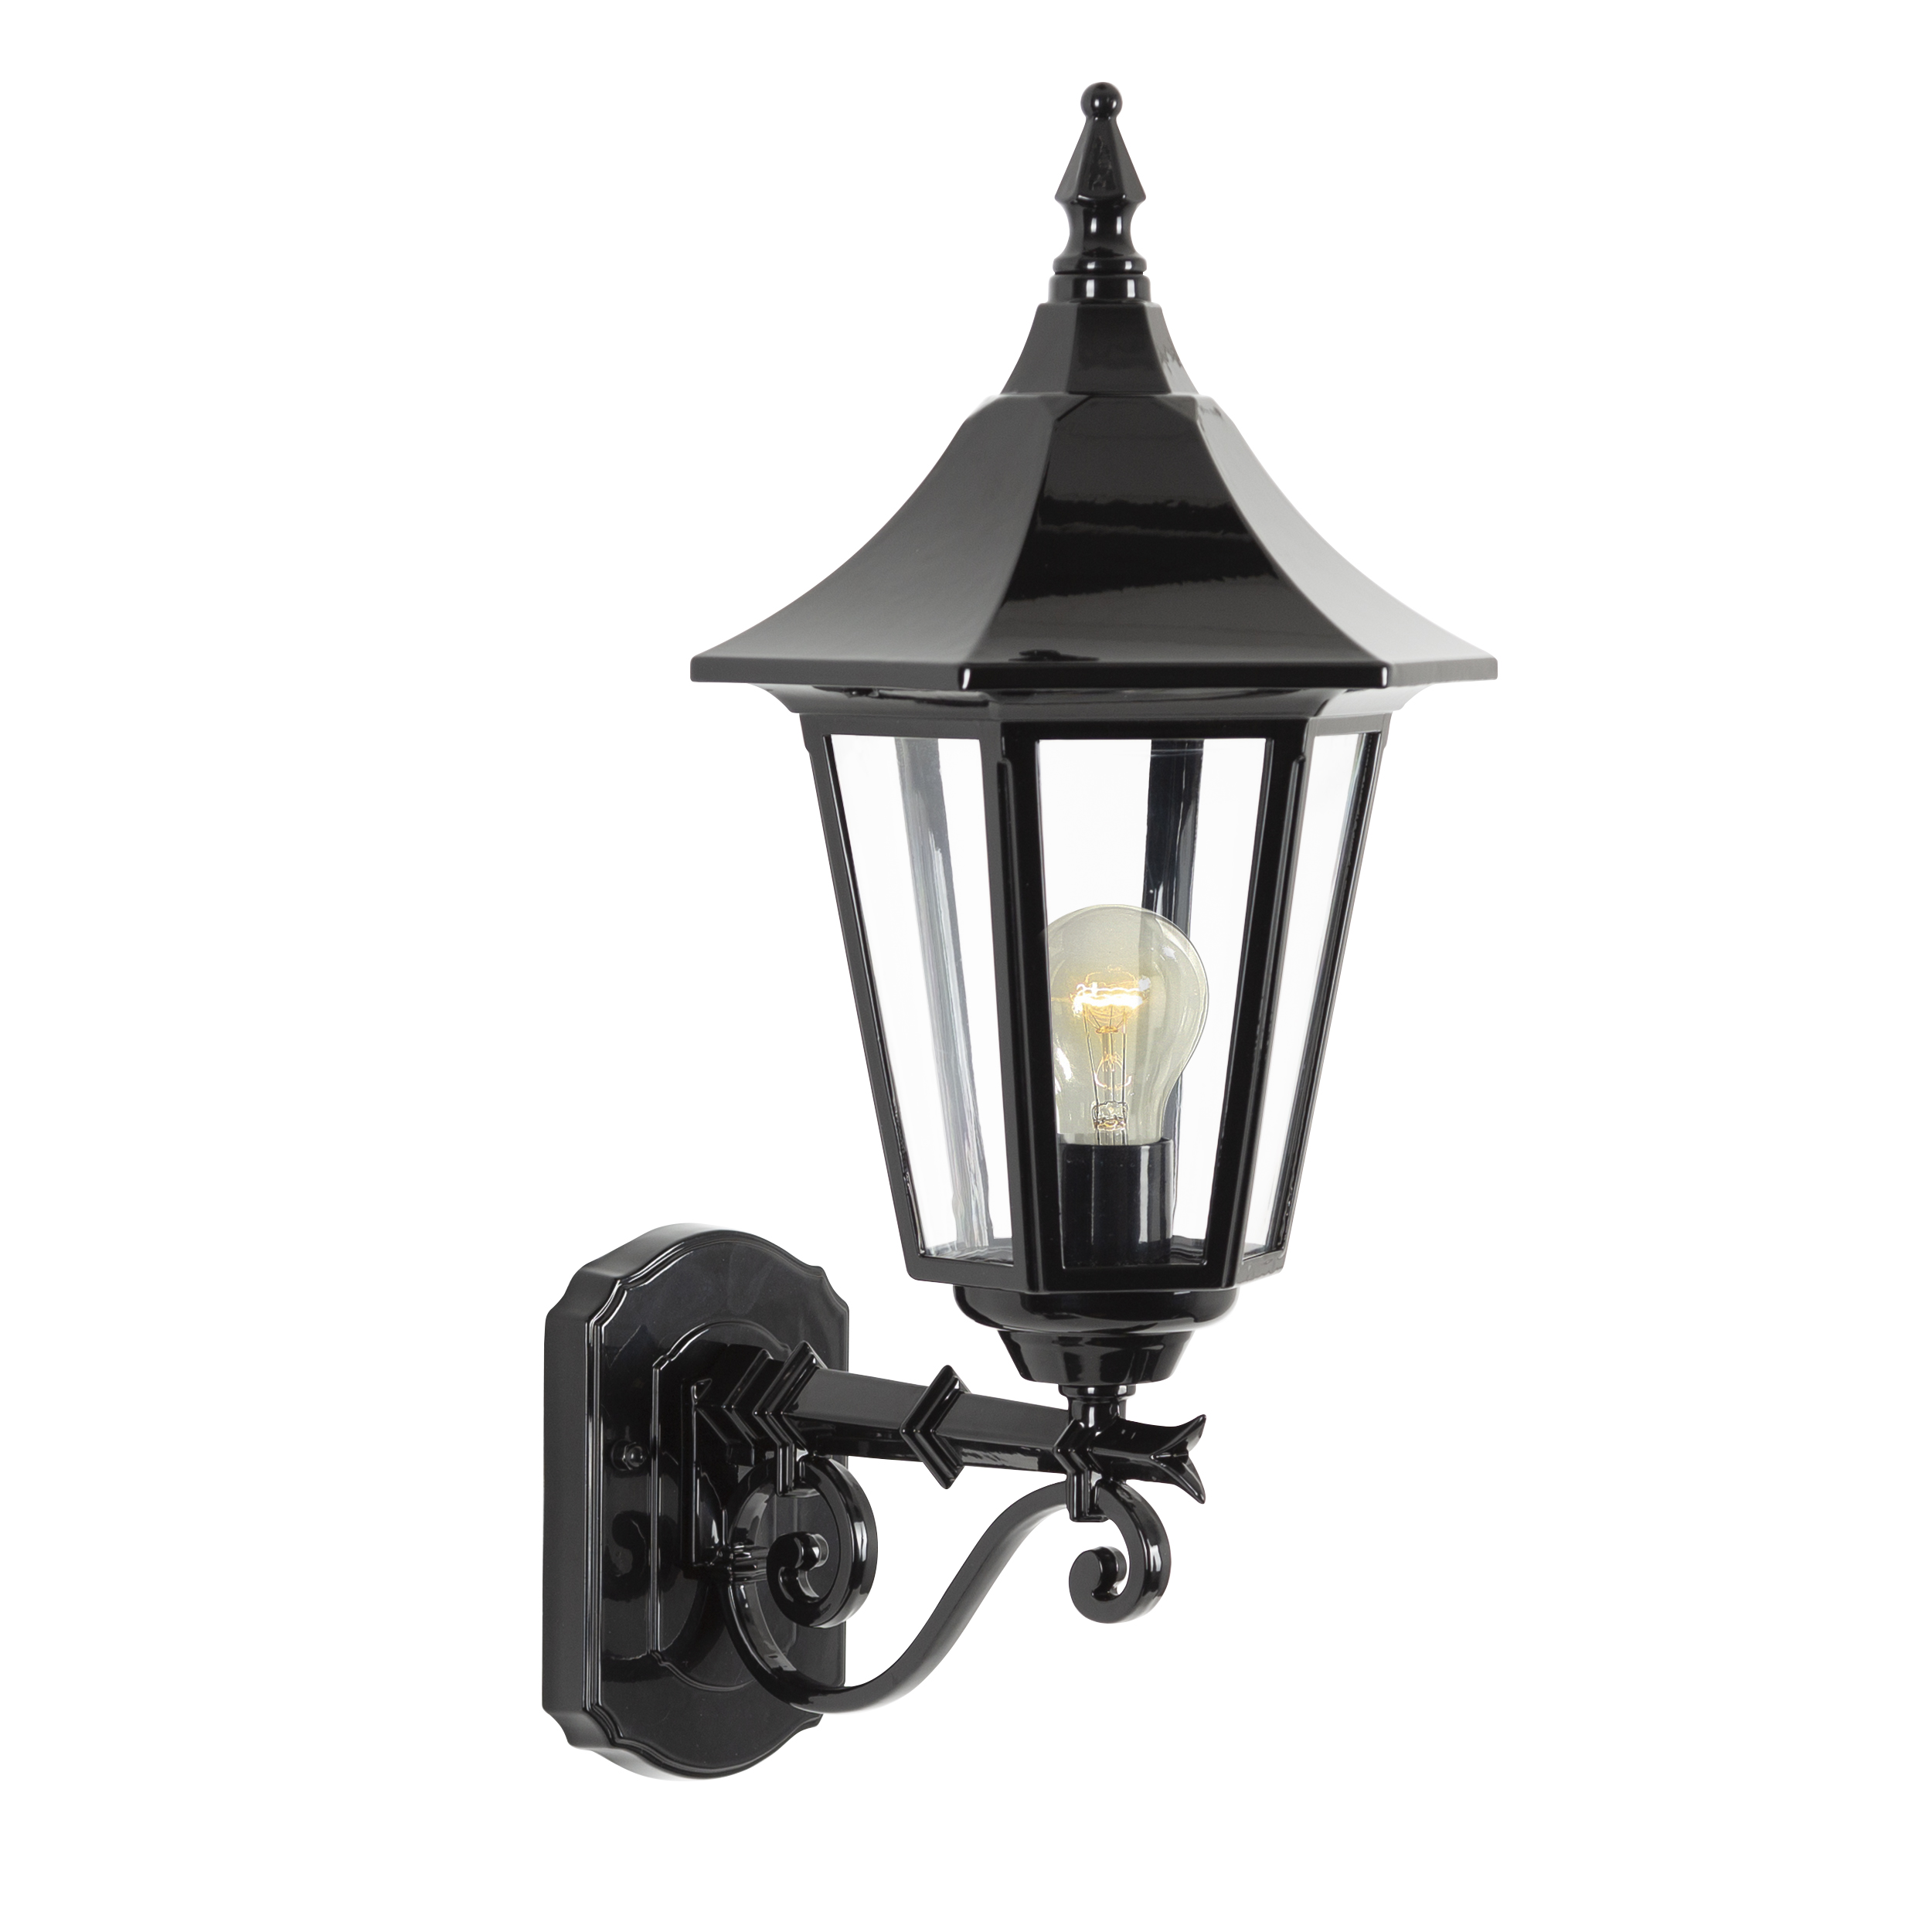 Zeist Wandlamp